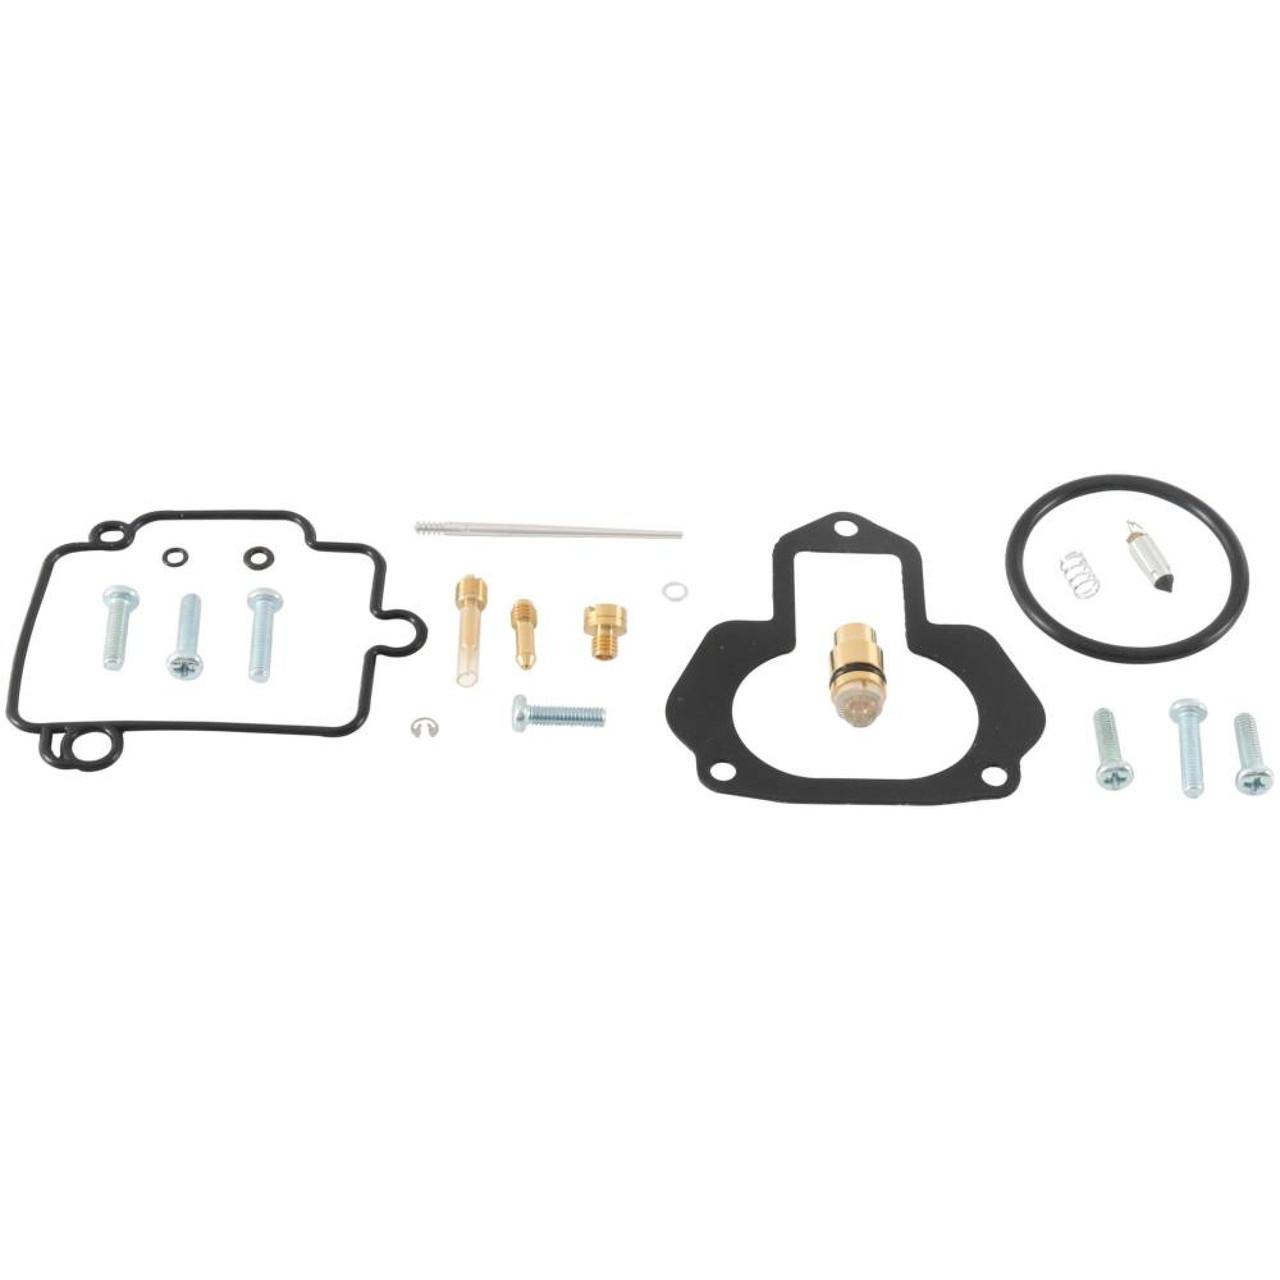 Premium New RP6408 Rear Wheel Bearing Heavy Duty for TrucksTRP1559TV  R1559